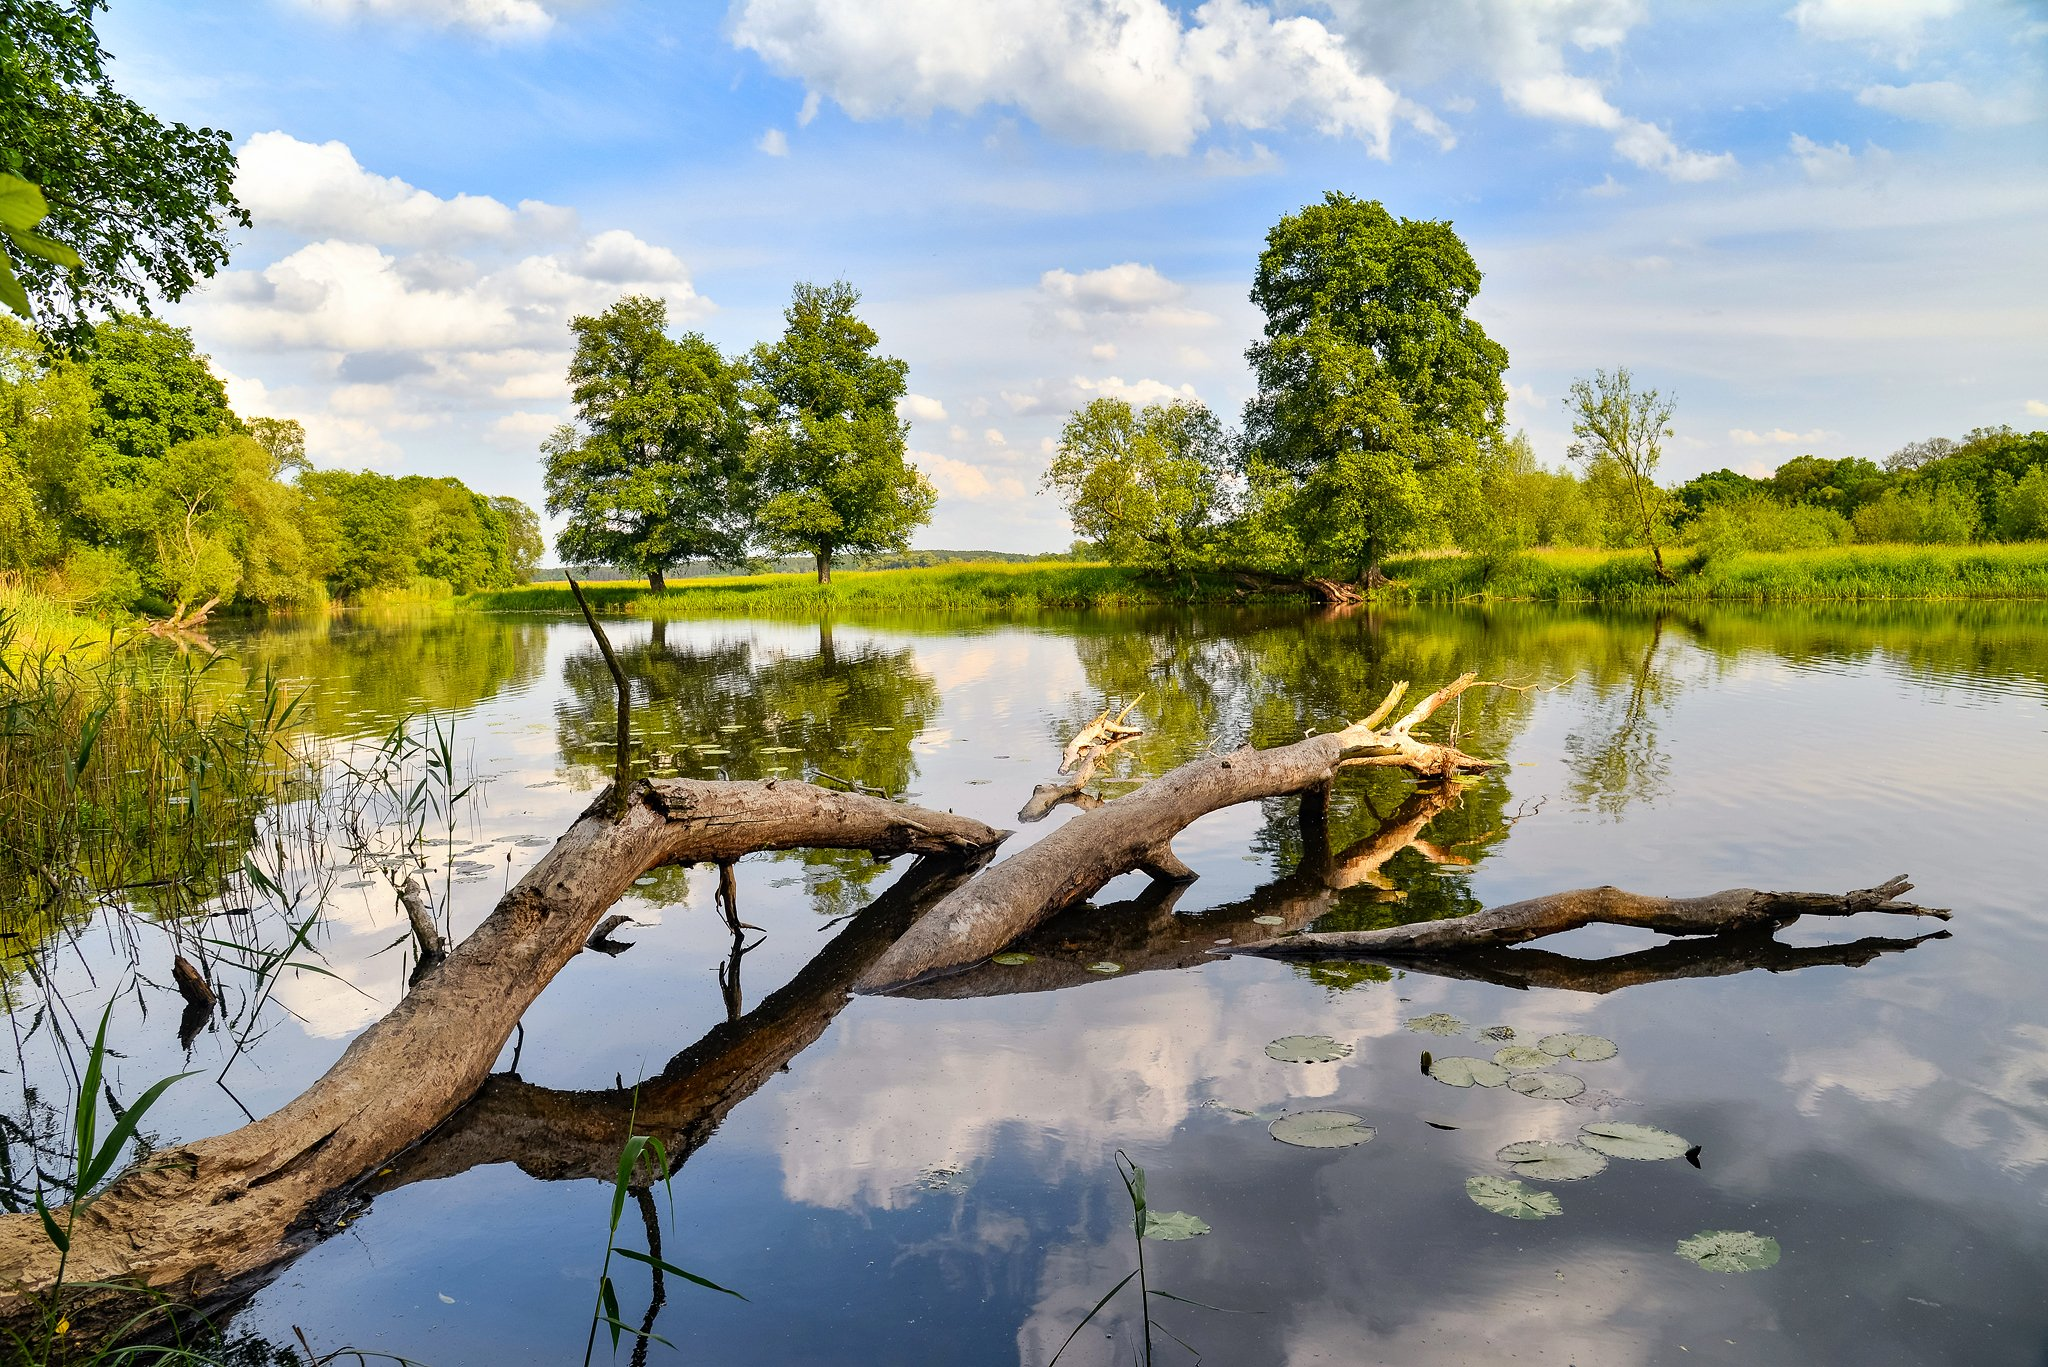 odertal national park water tree trees clouds sky green schwedt oder lake blue, Radoslaw Dranikowski